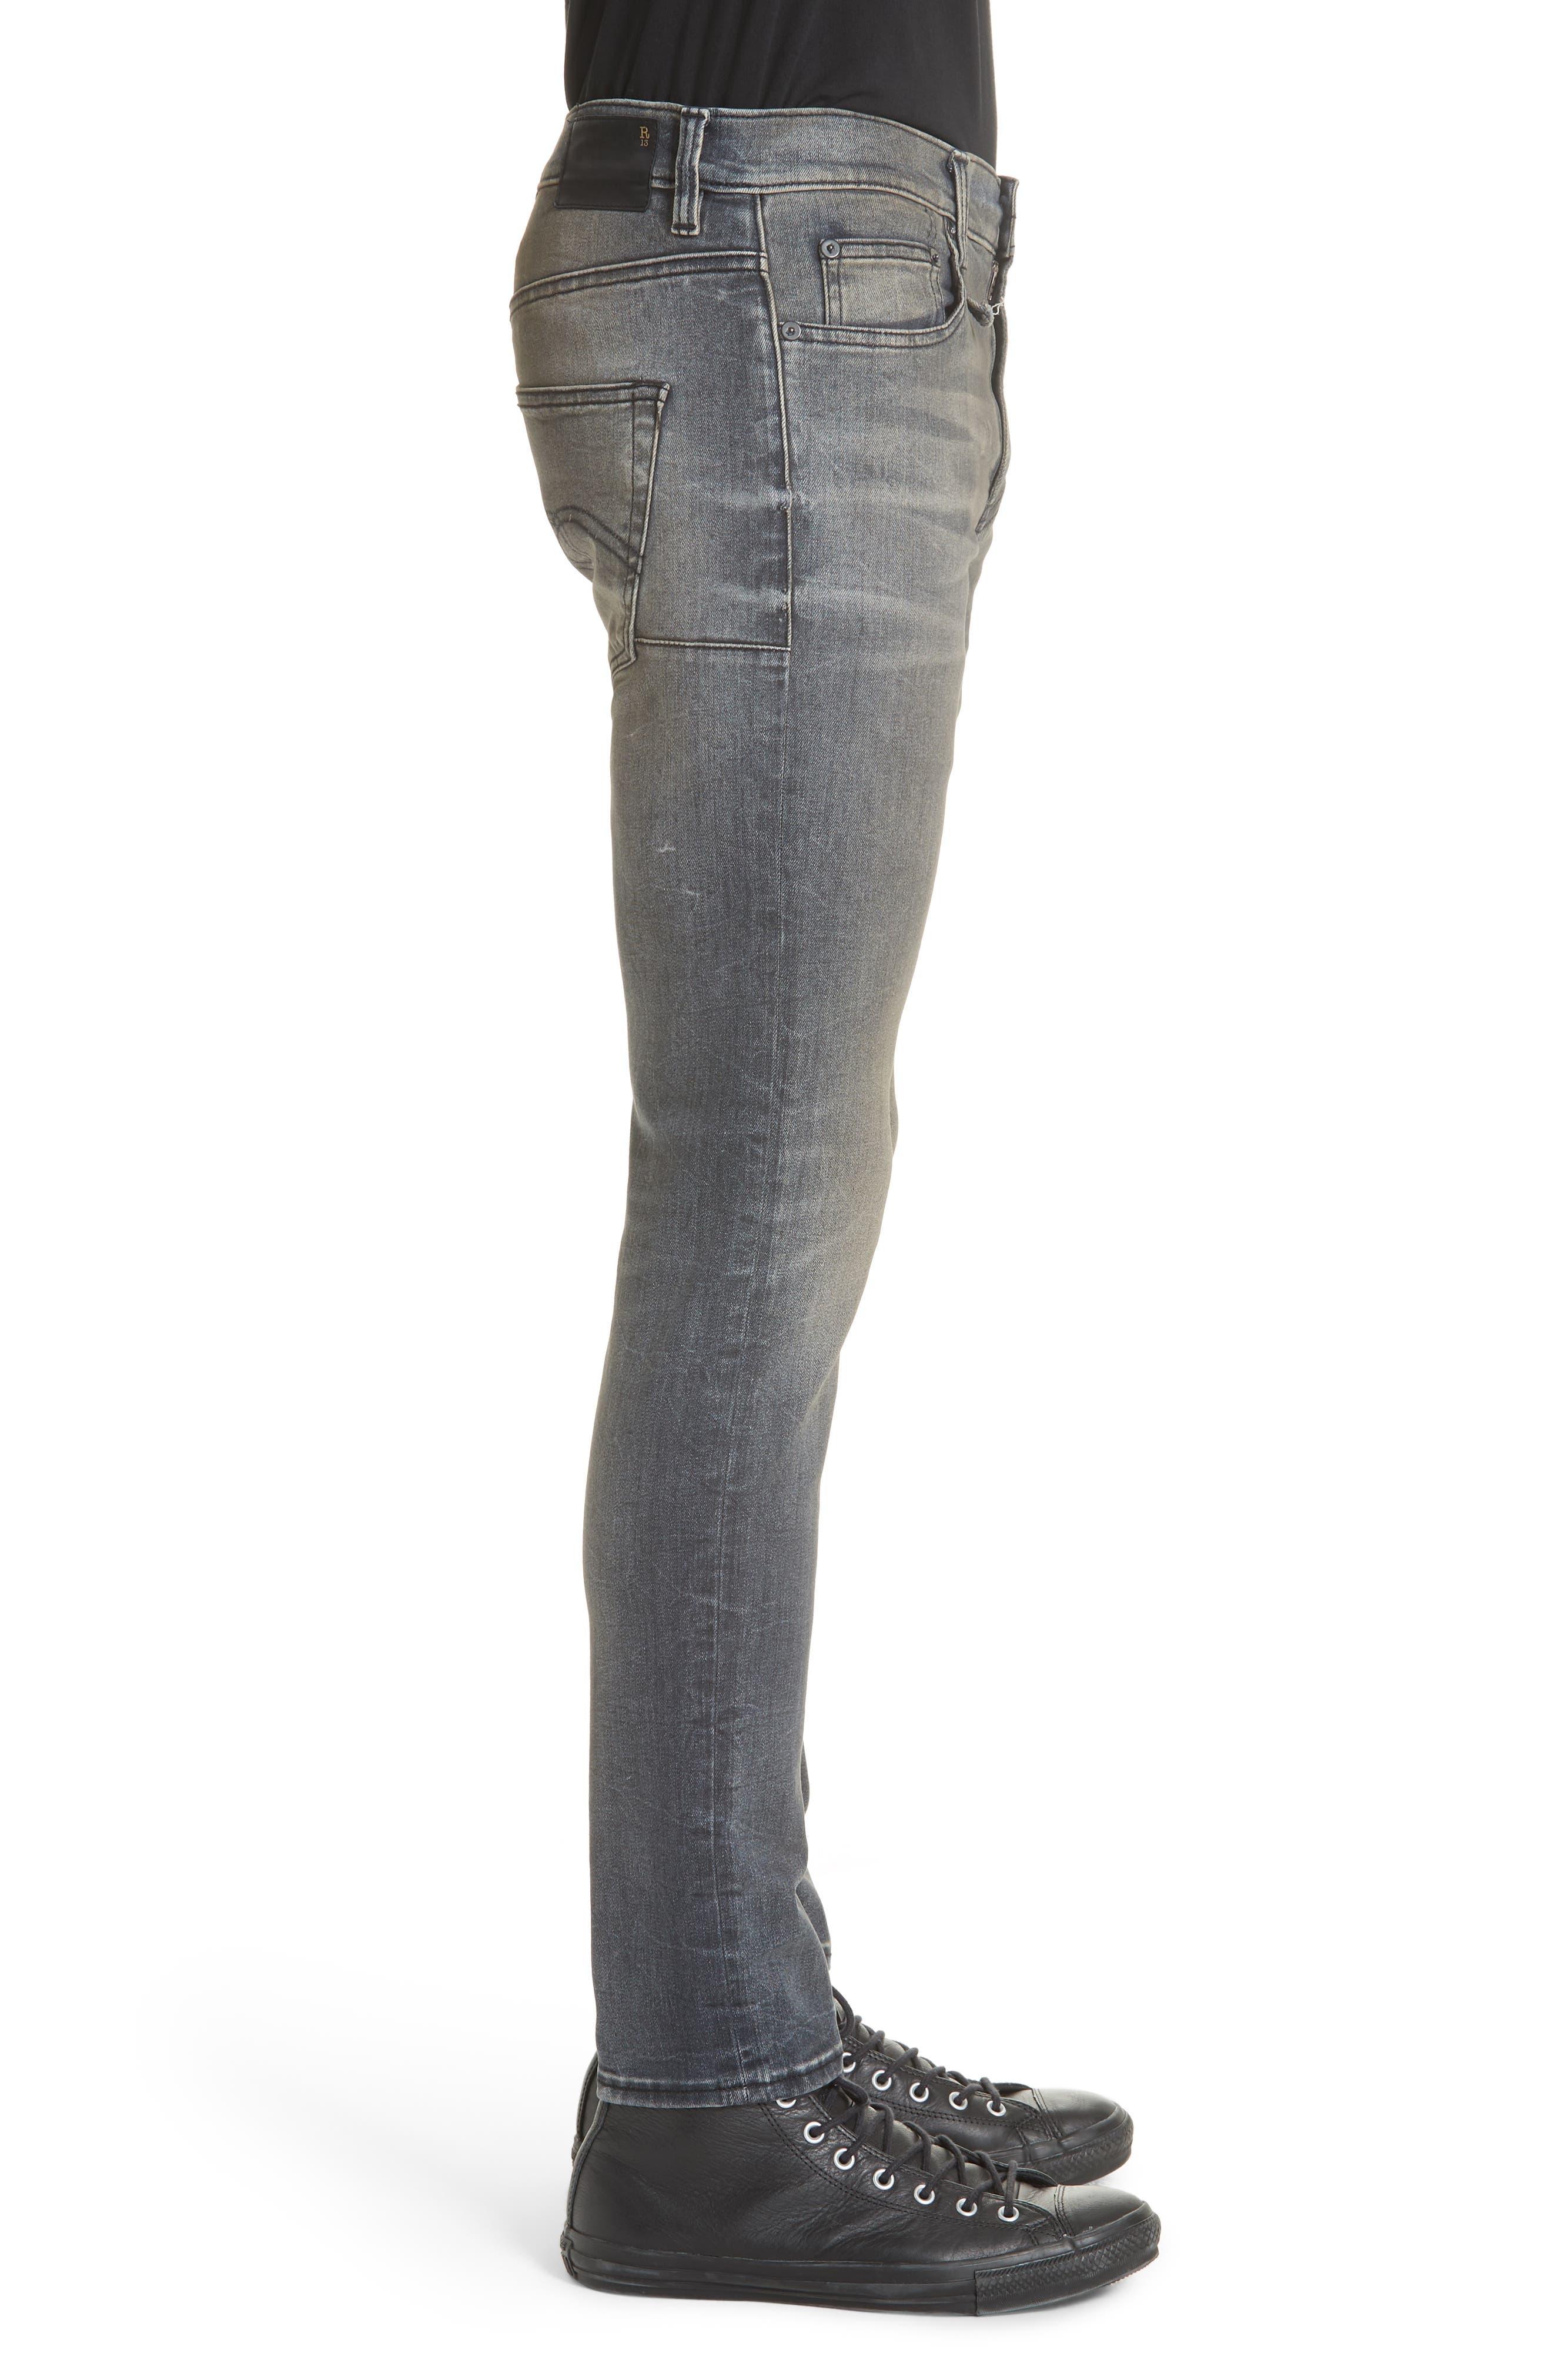 Skate Slim Fit Jeans,                             Alternate thumbnail 3, color,                             001